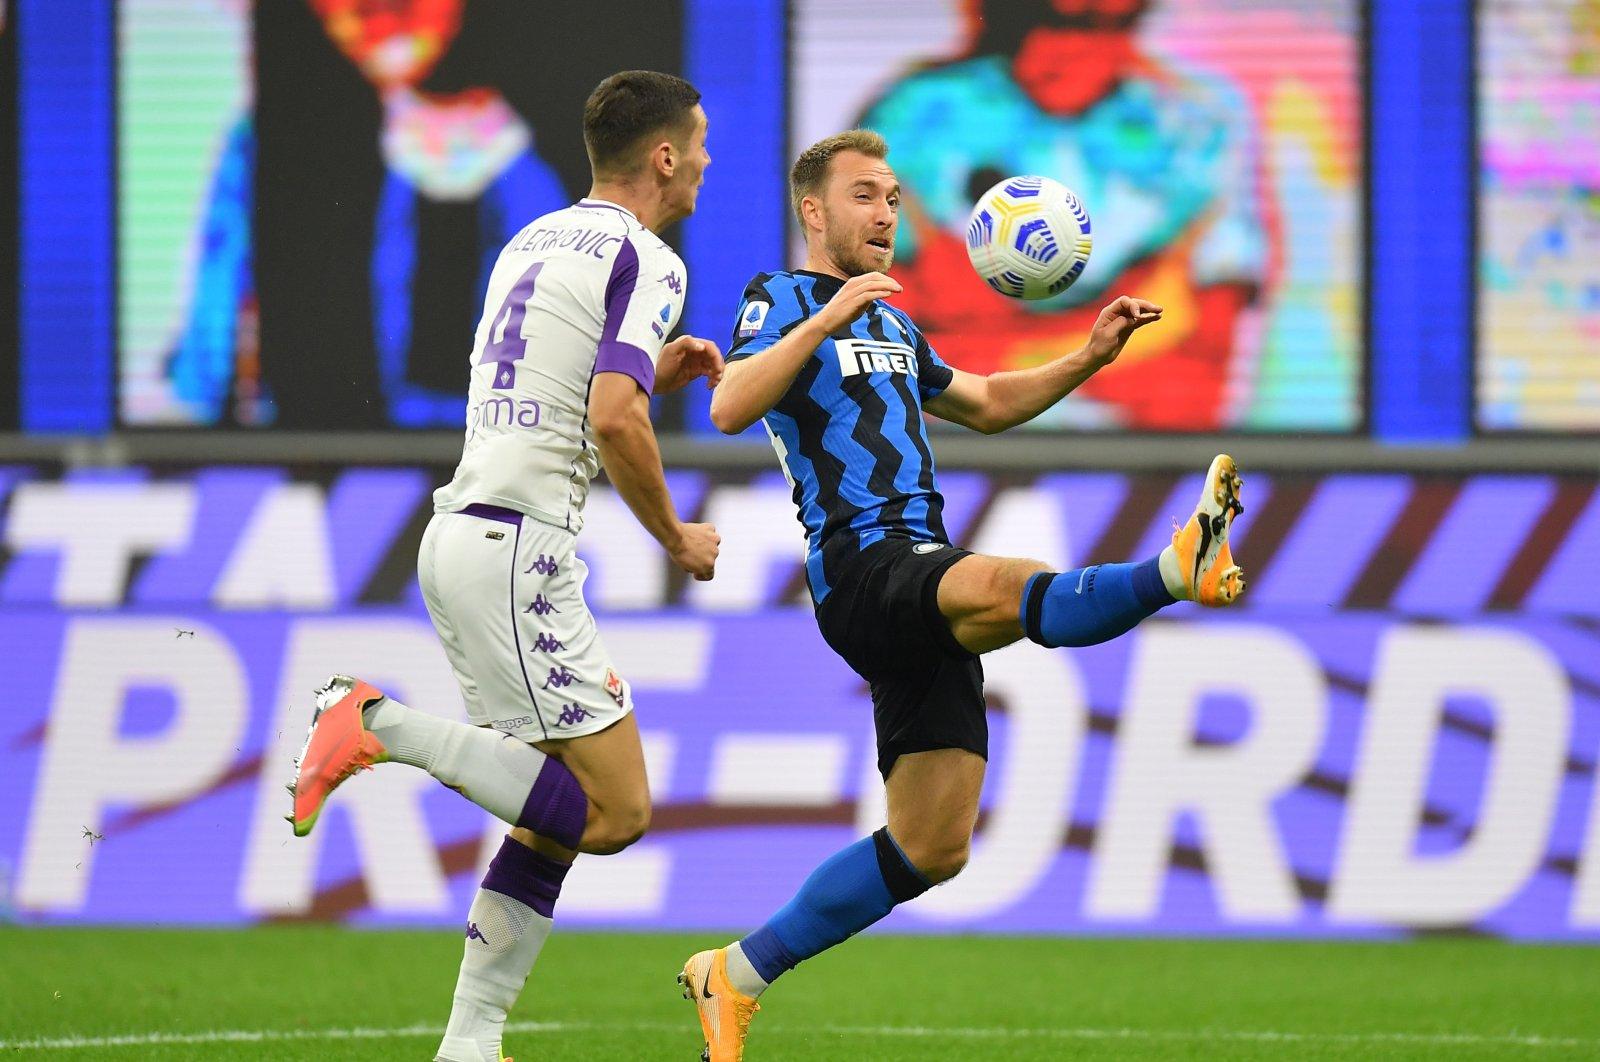 Inter Milan's Christian Eriksen (R) in action with Fiorentina's Nikola Milenkovic, in Milan, Italy, Sept. 26, 2020. (REUTERS Photo)